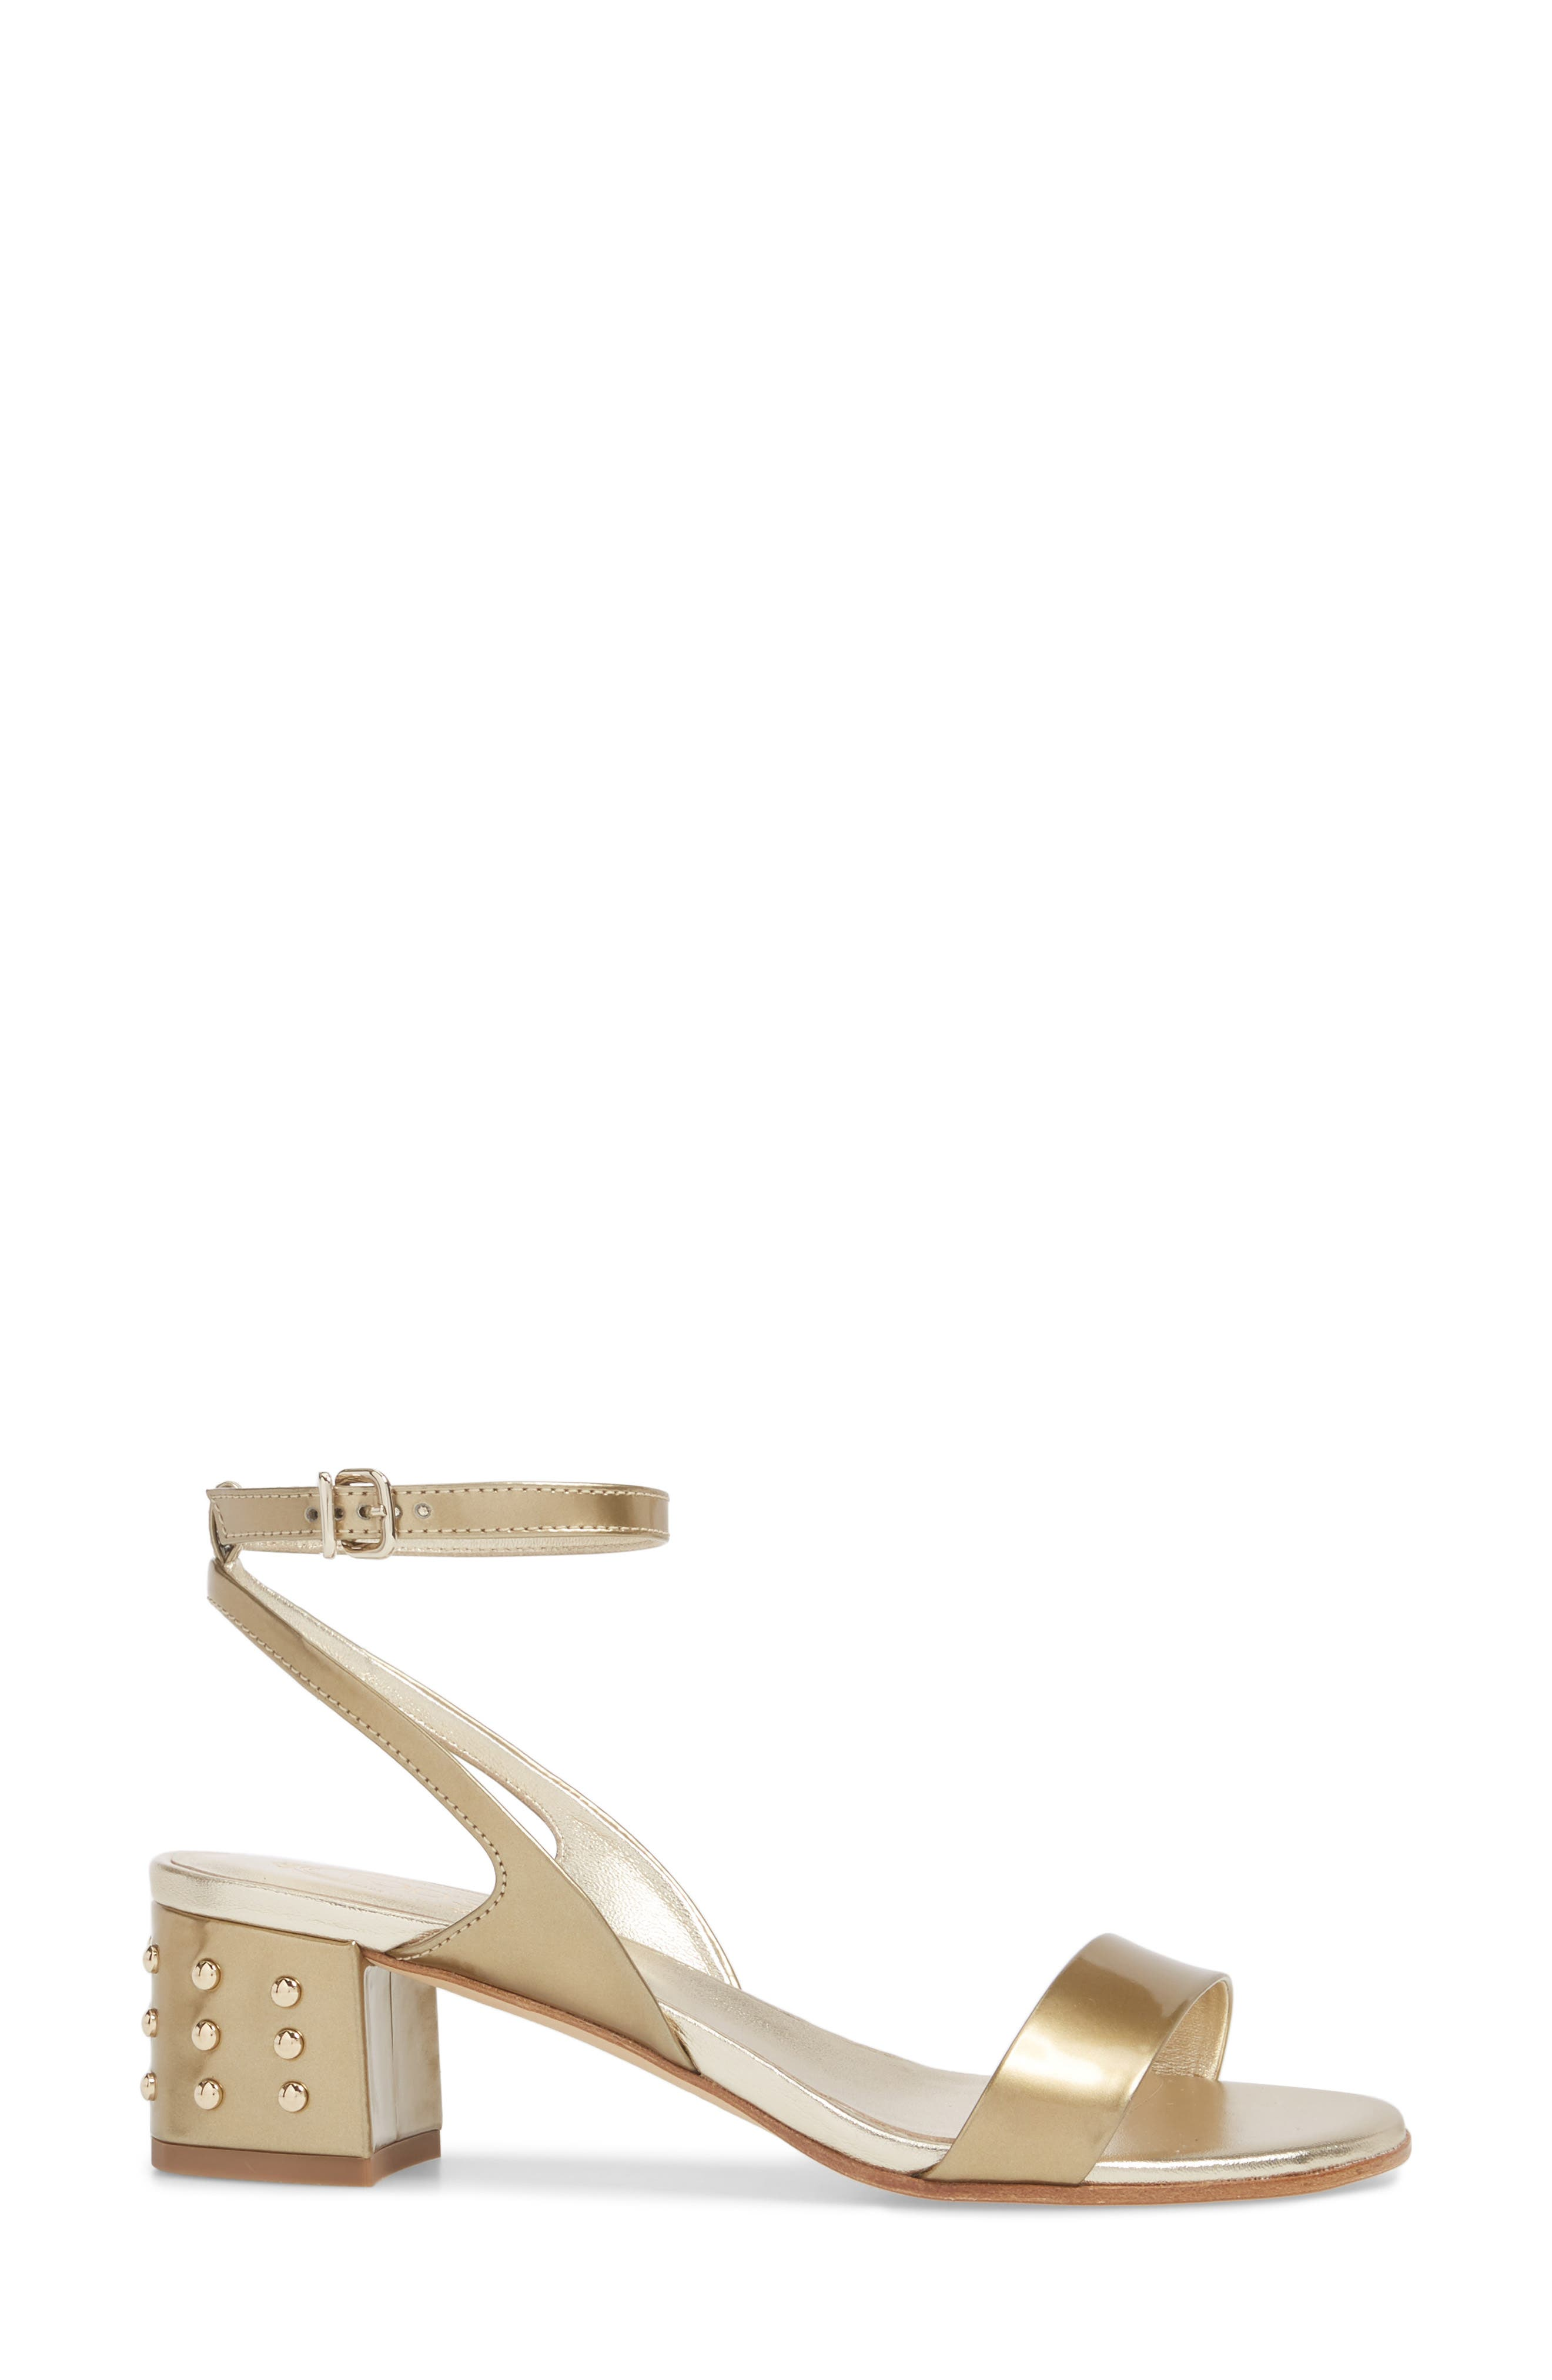 Gommini Block Heel Sandal,                             Alternate thumbnail 3, color,                             Gold